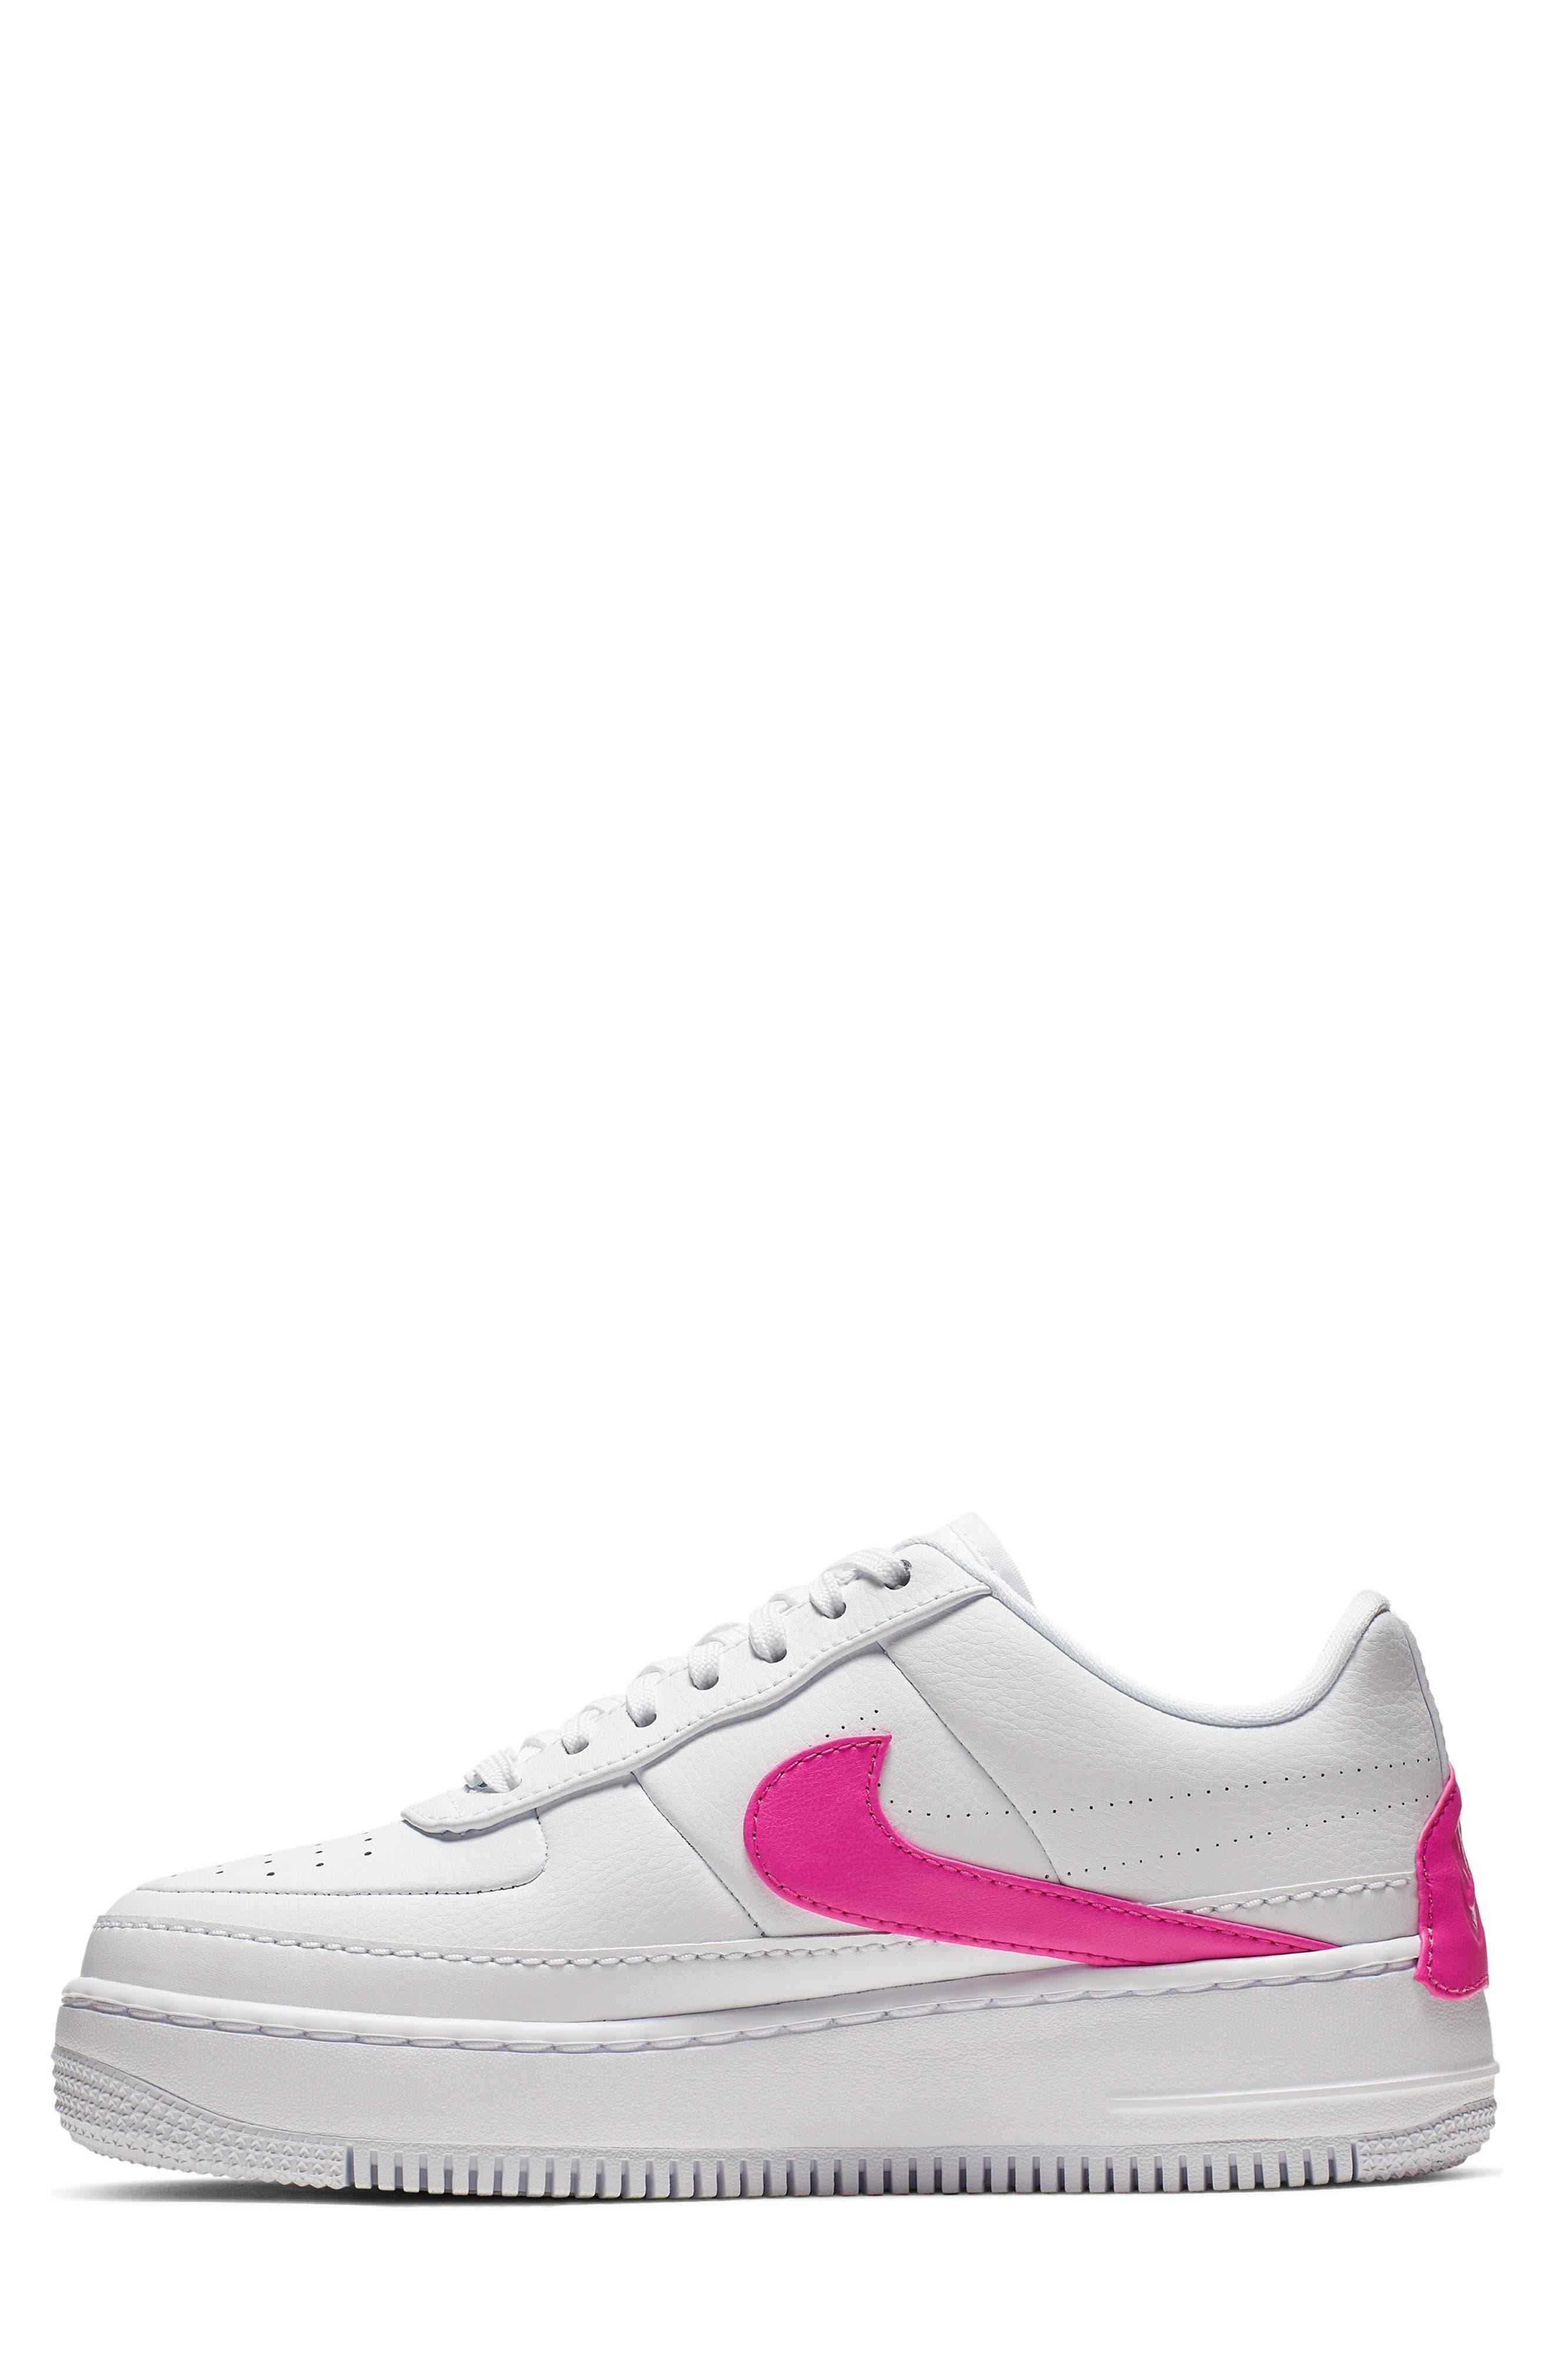 NIKE, Air Force 1 Jester XX Sneaker, Alternate thumbnail 3, color, WHITE/ LASER FUCHSIA